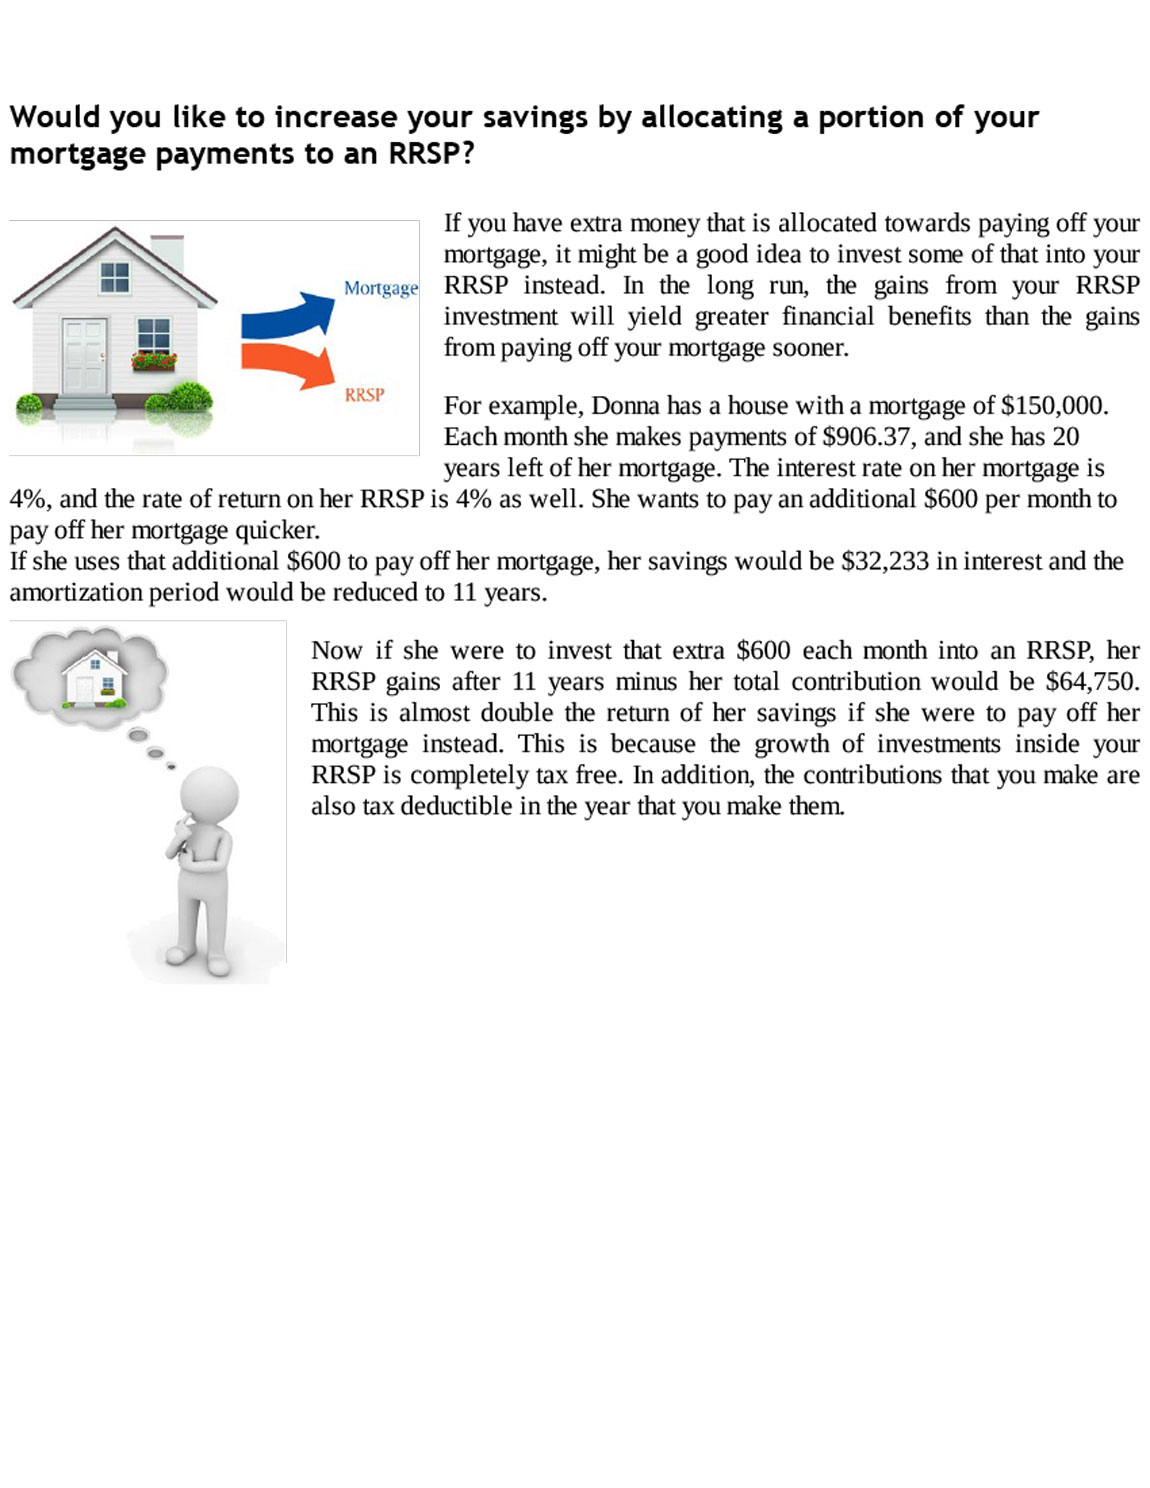 101 tax secrets for canadians pdf download